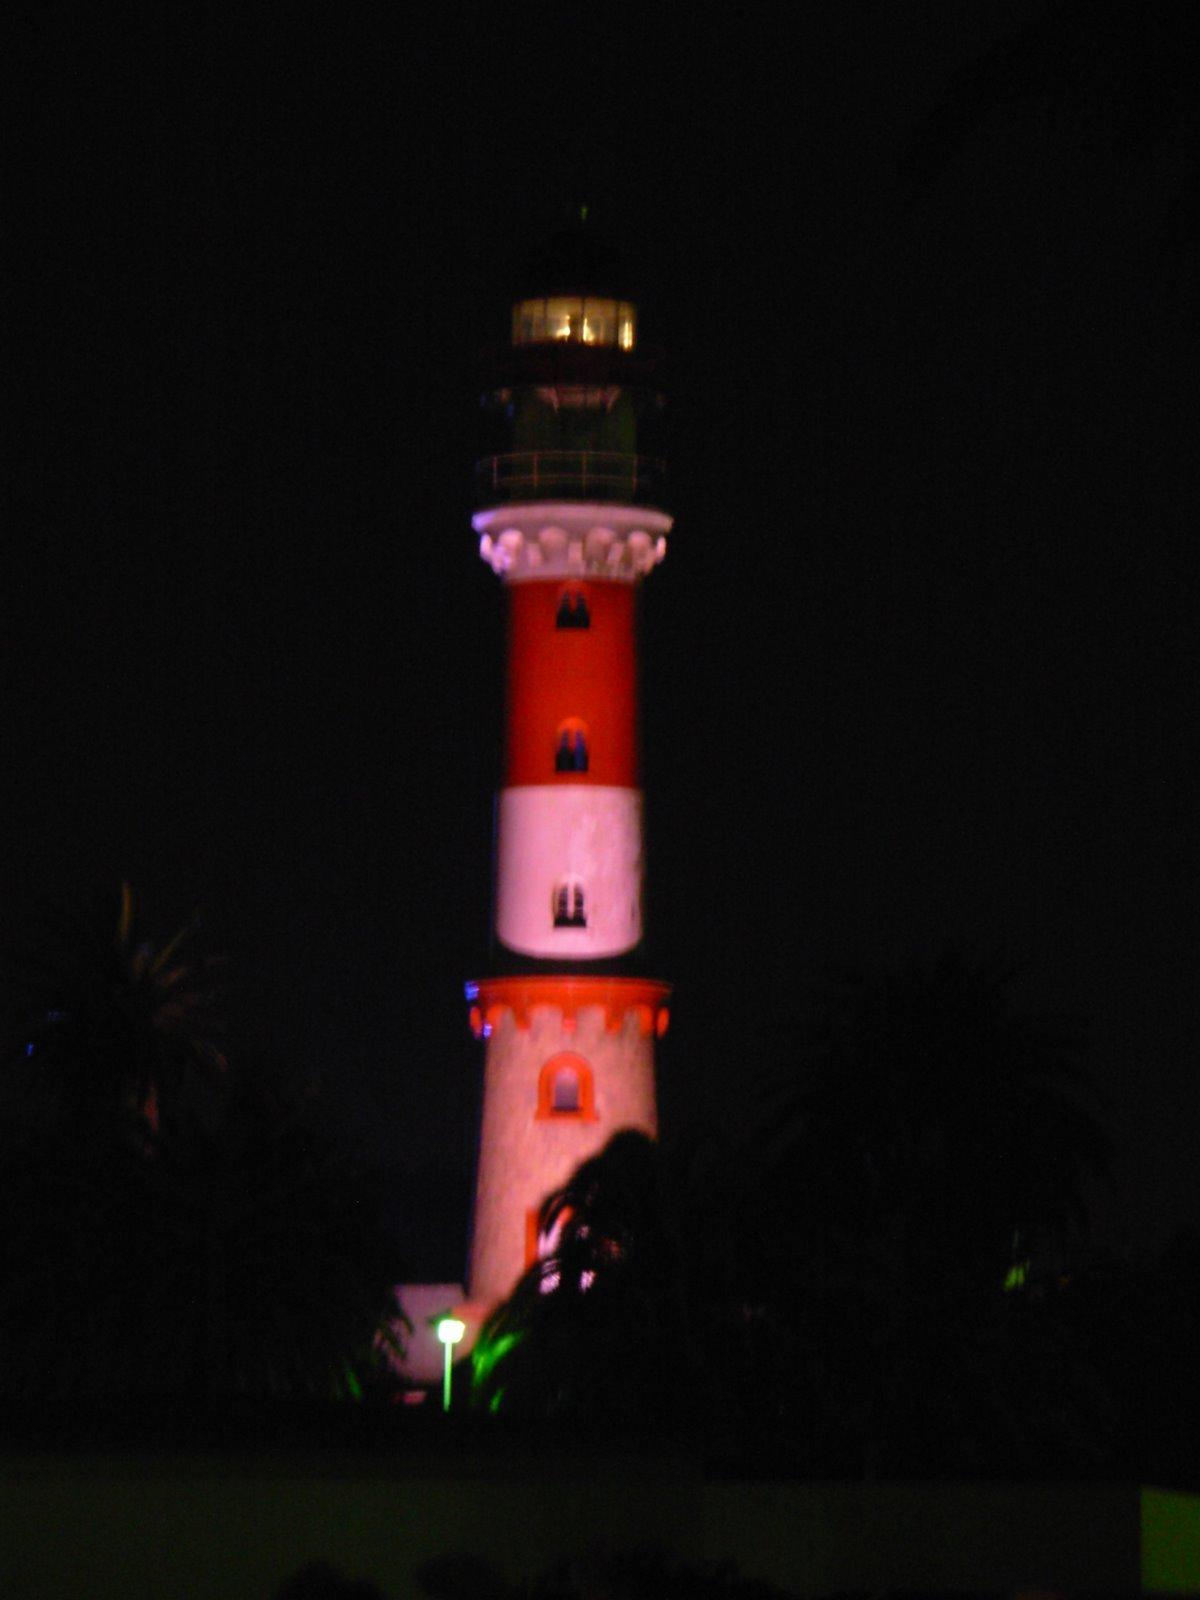 [lighthouse]